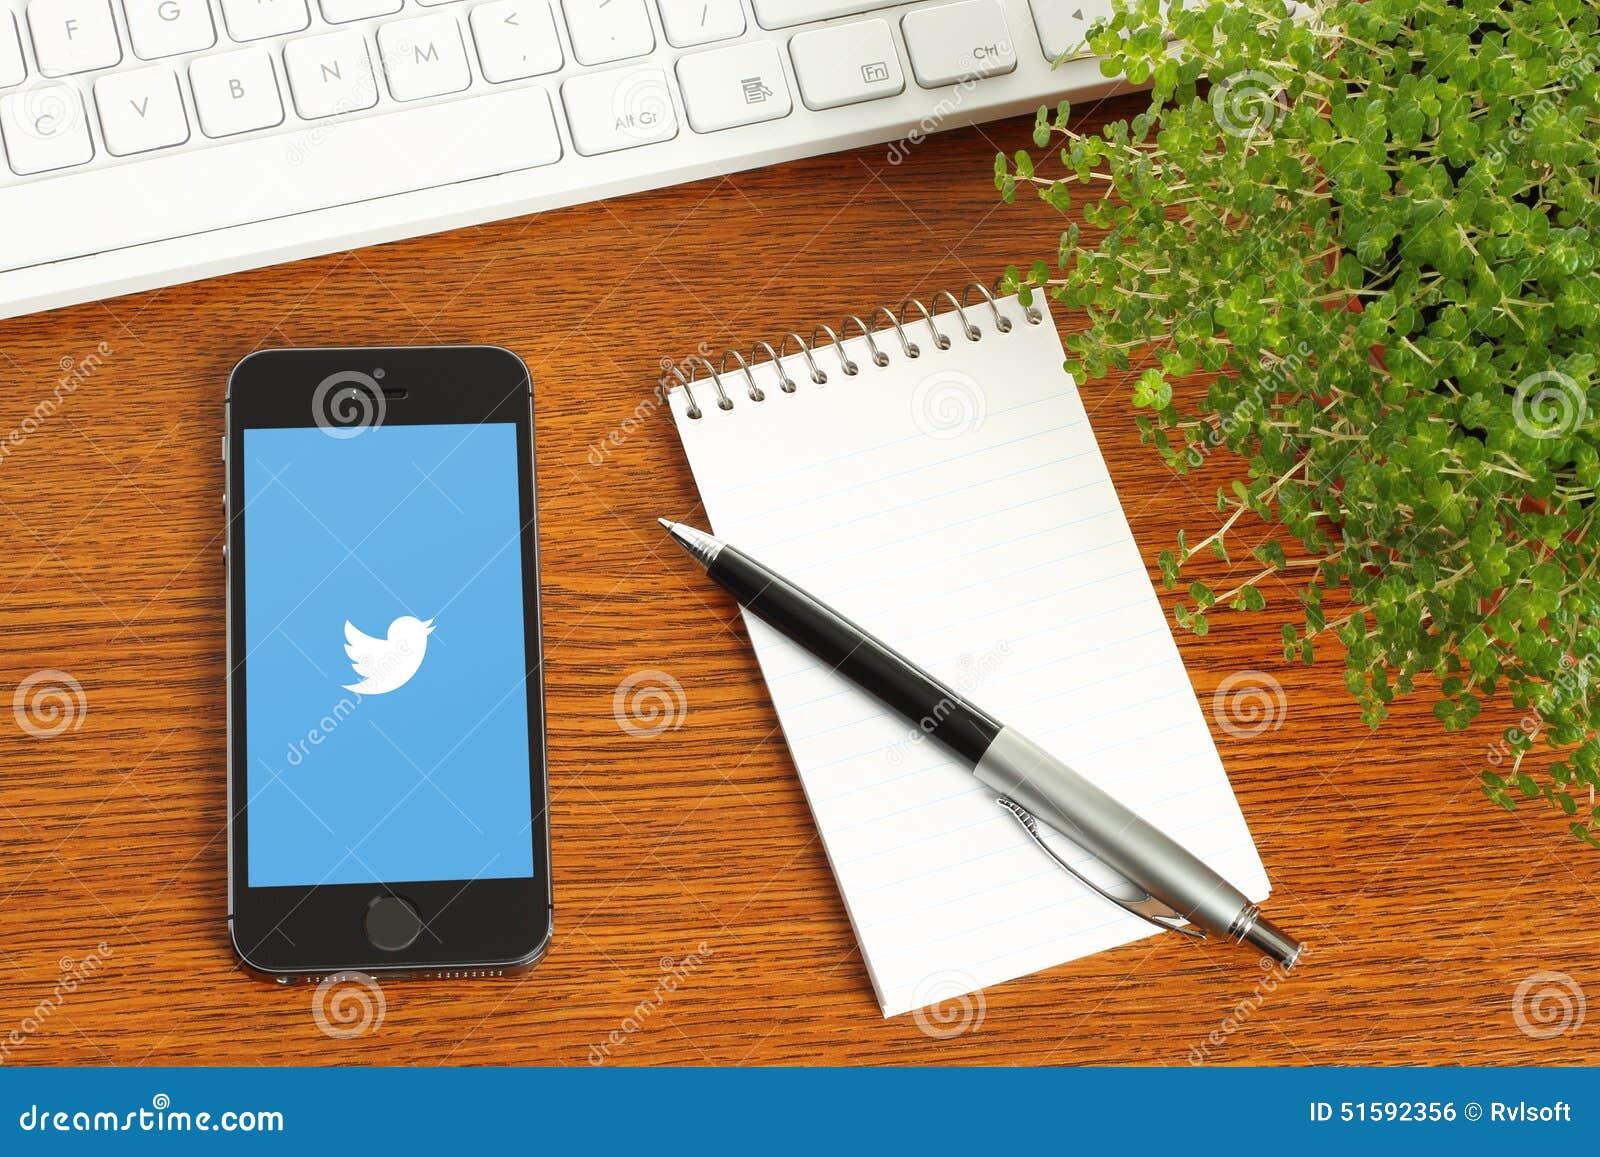 IPhone с логотипом Twitter на деревянной предпосылке